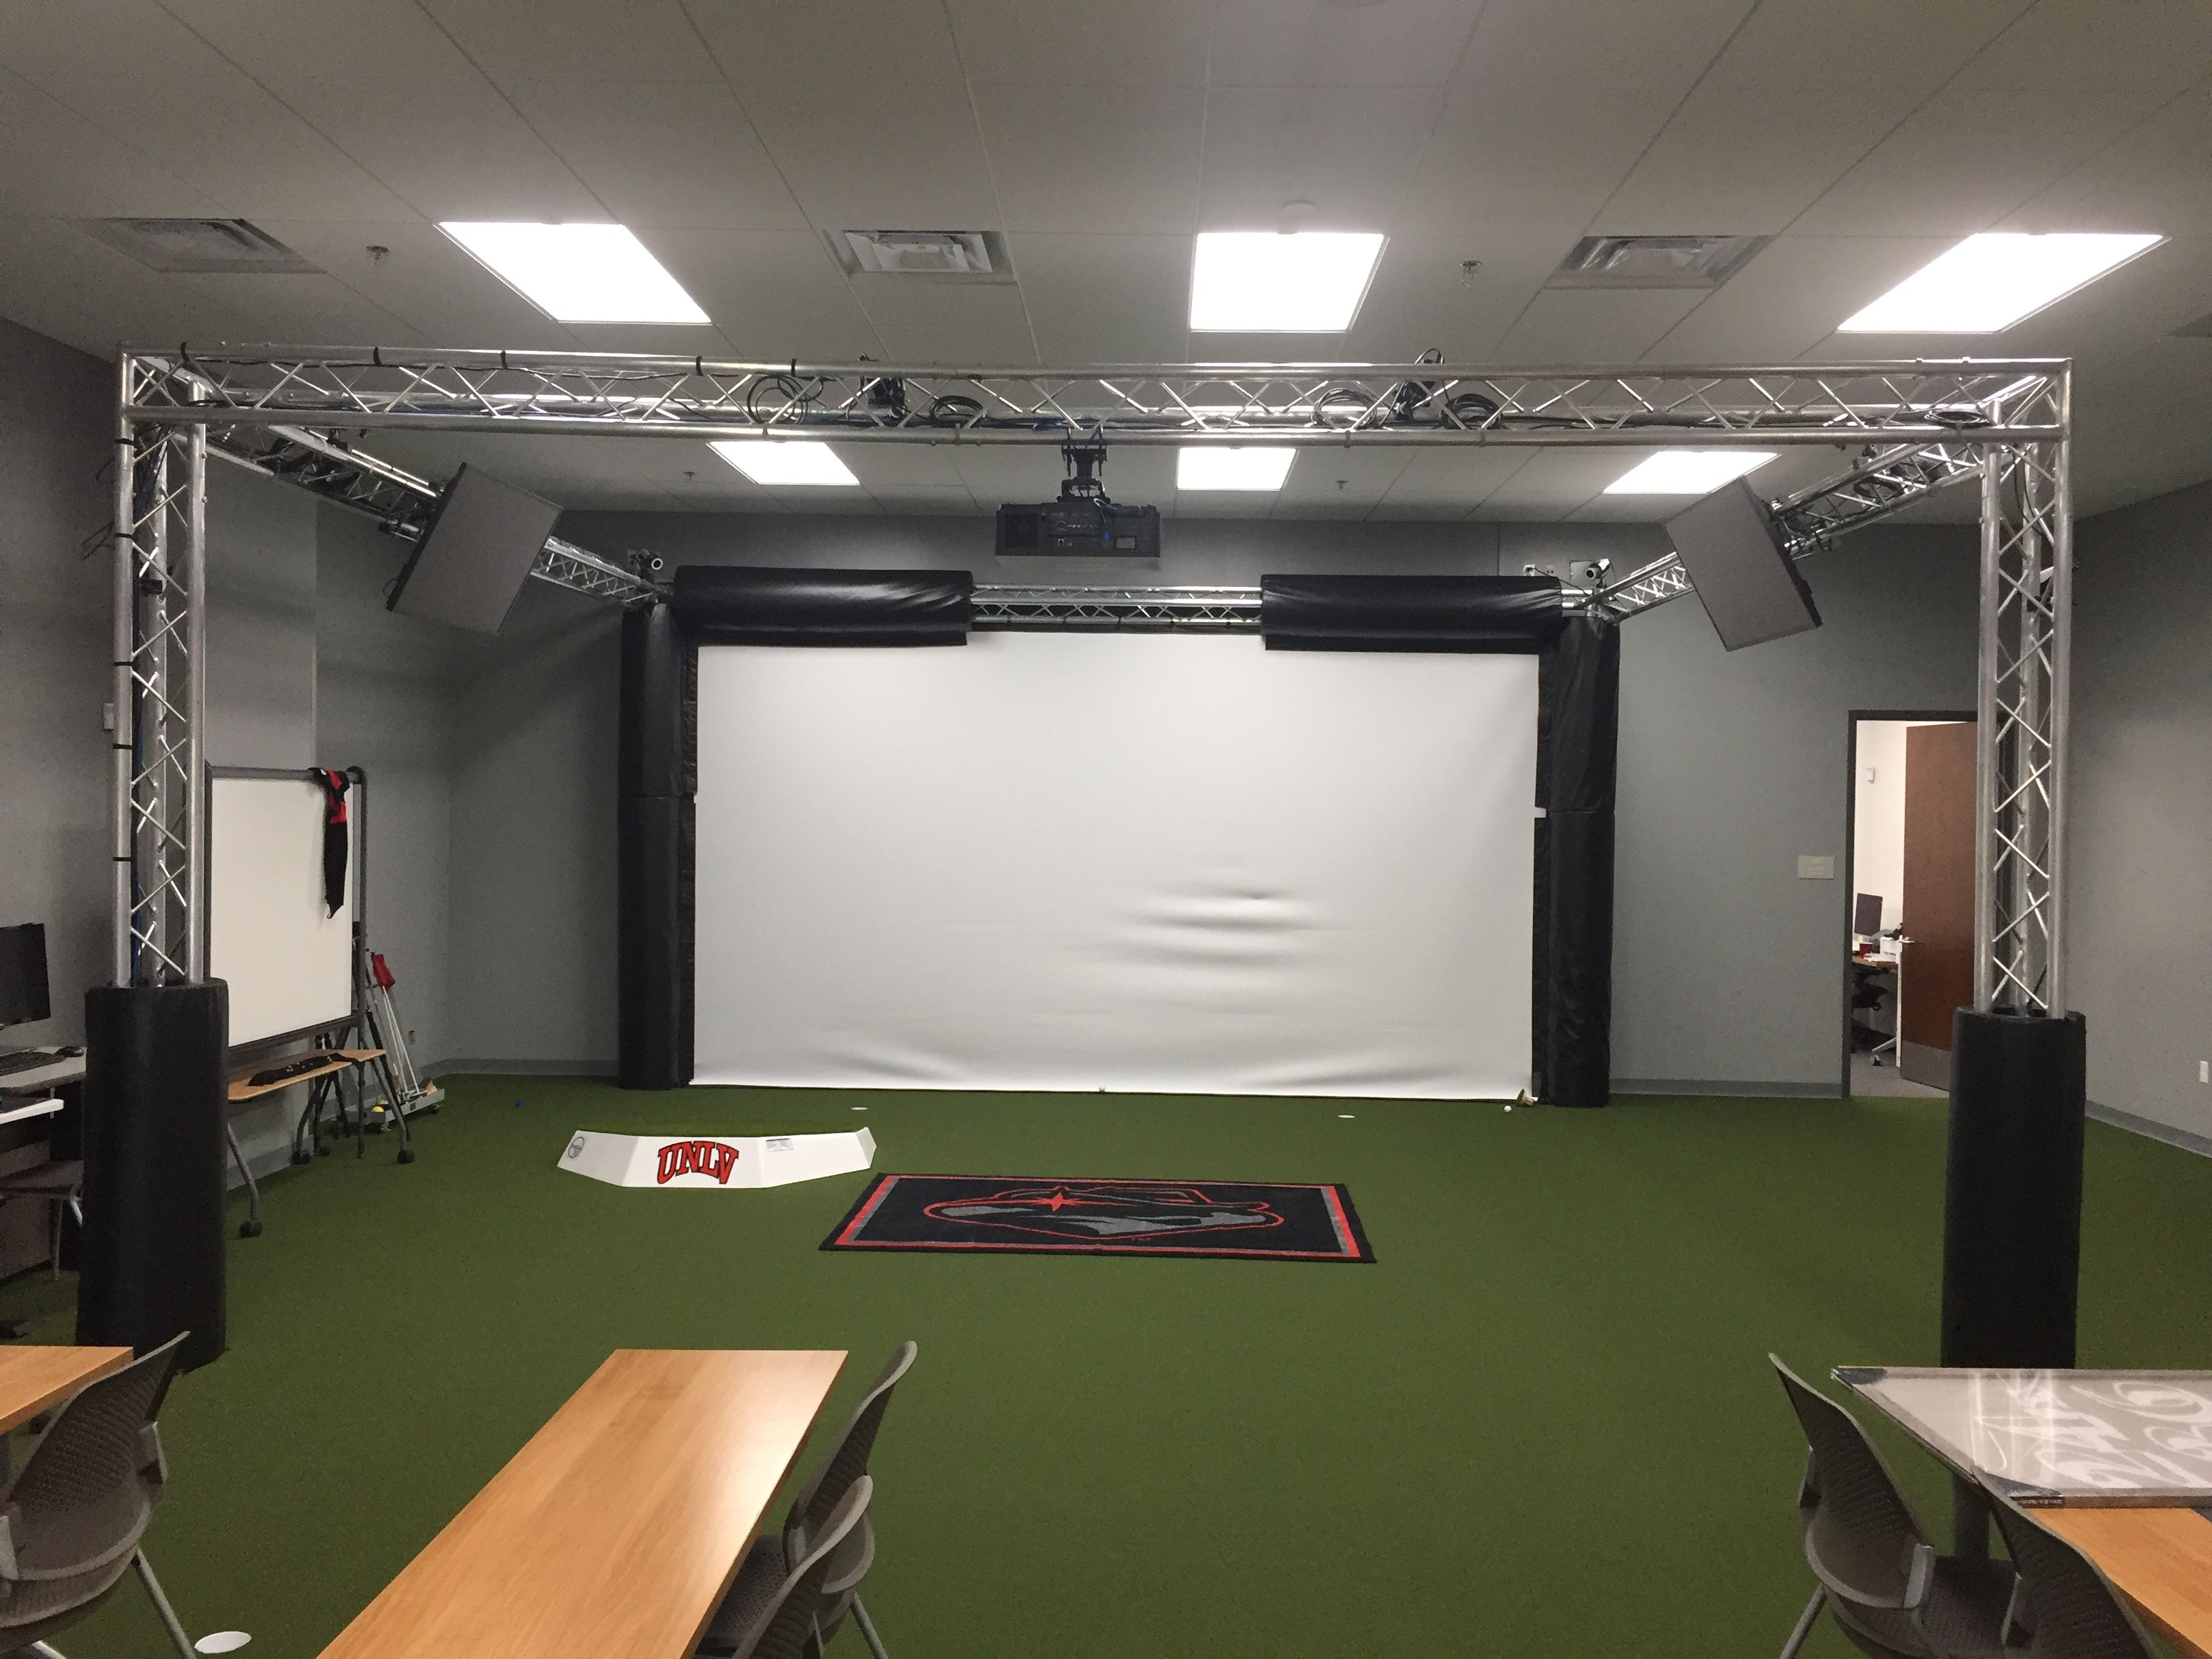 Unlv Golf Simulator Golf Simulator Room Golf Simulators Golf Room